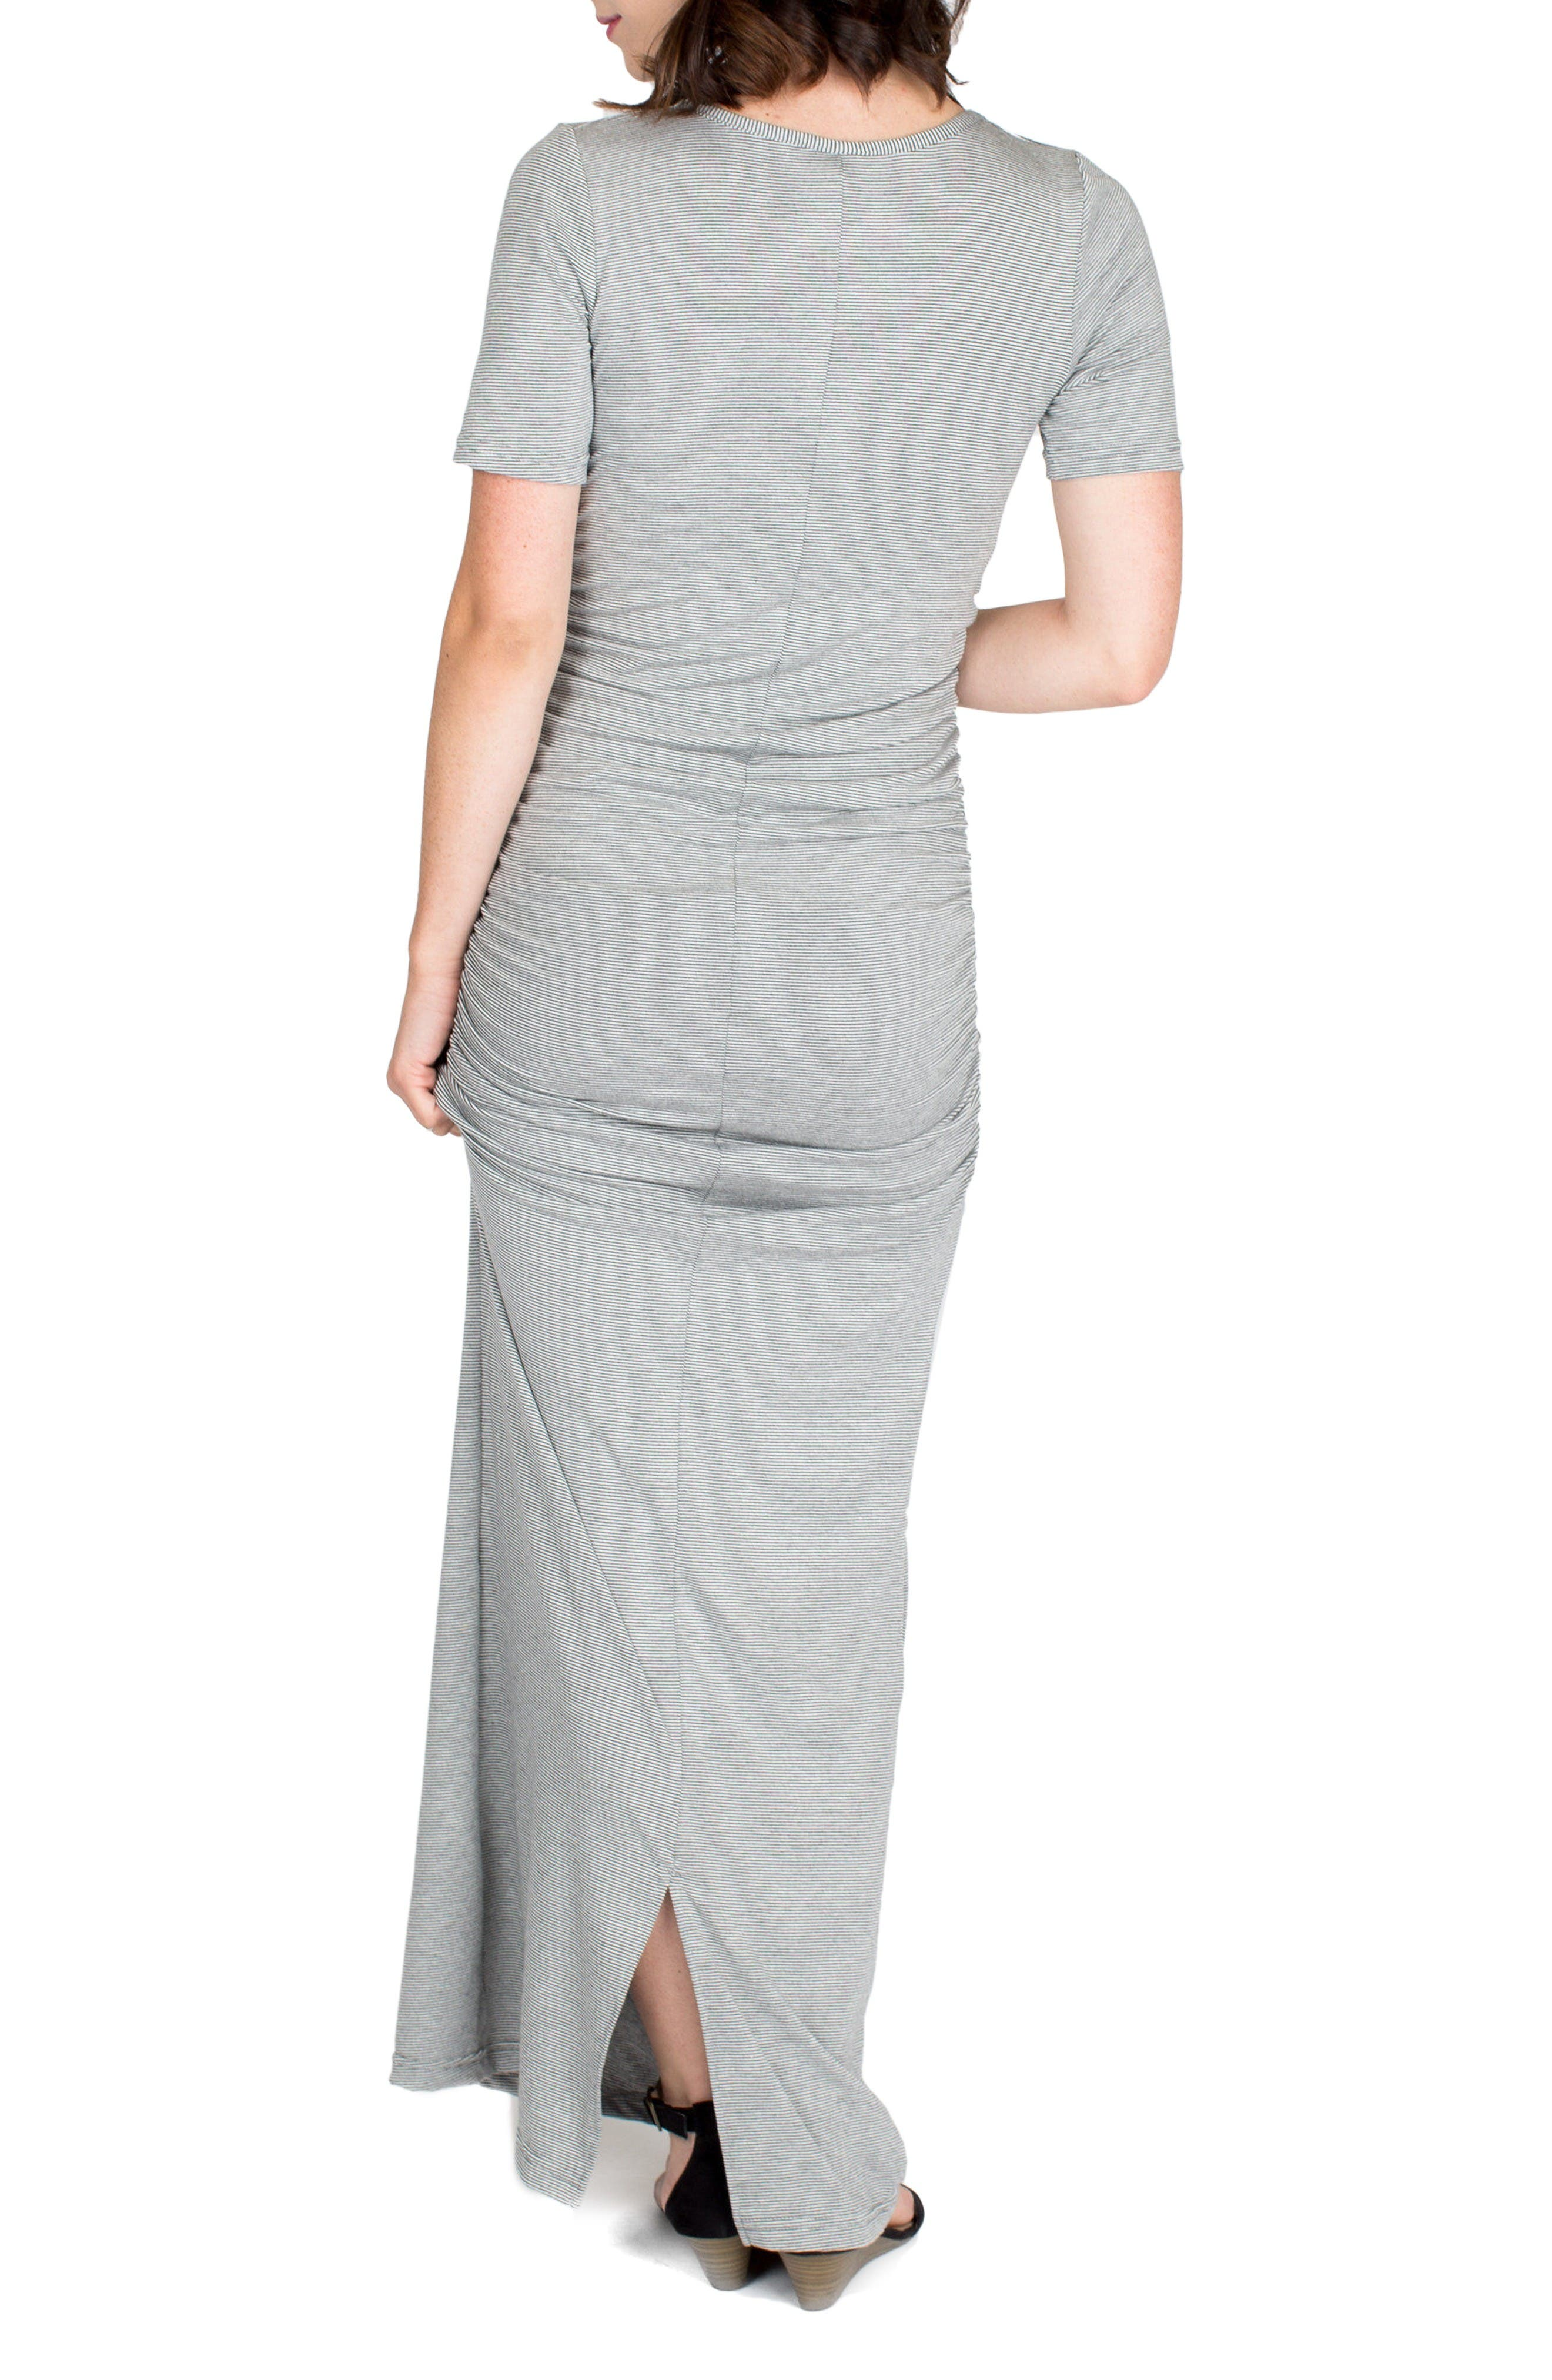 'Heidi' Maxi Maternity Dress,                             Alternate thumbnail 3, color,                             Charcoal Microstripe